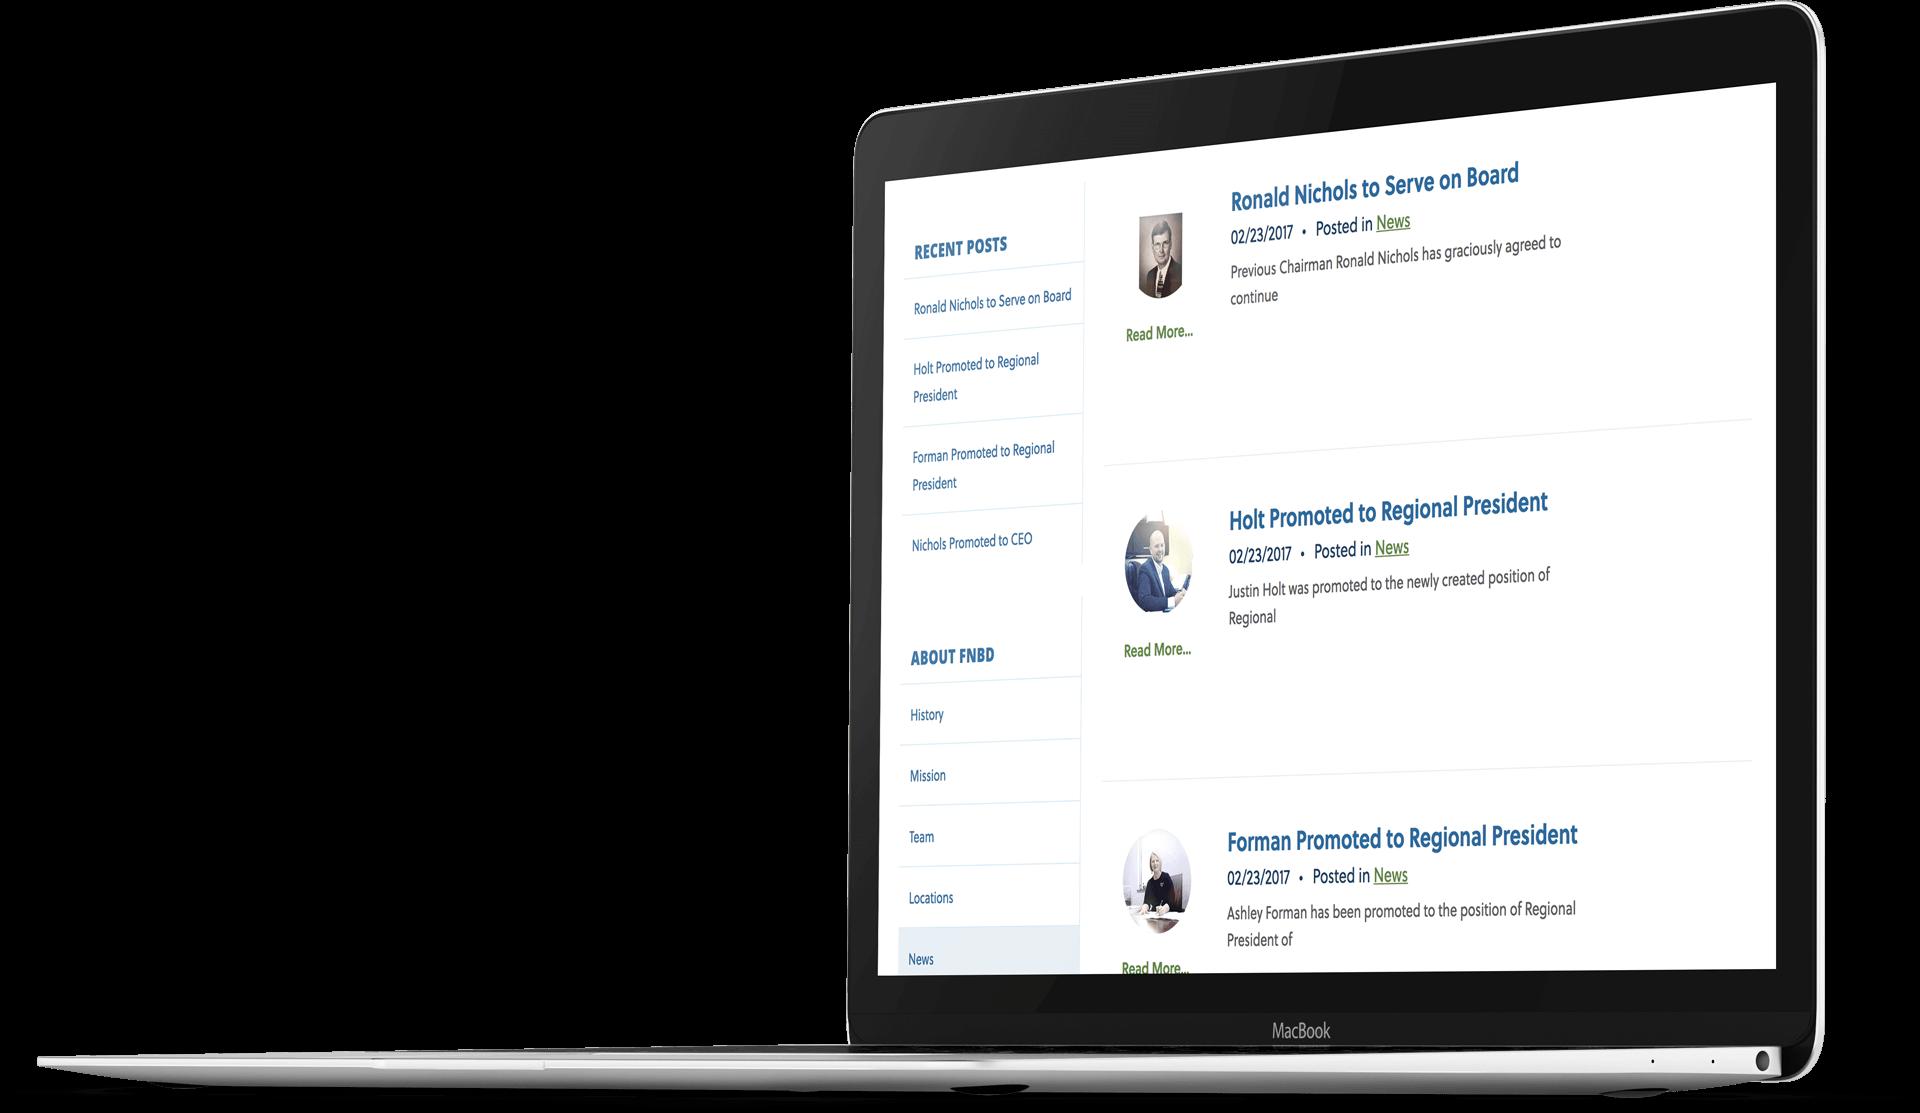 Bank website design for FNBD on a laptop screen